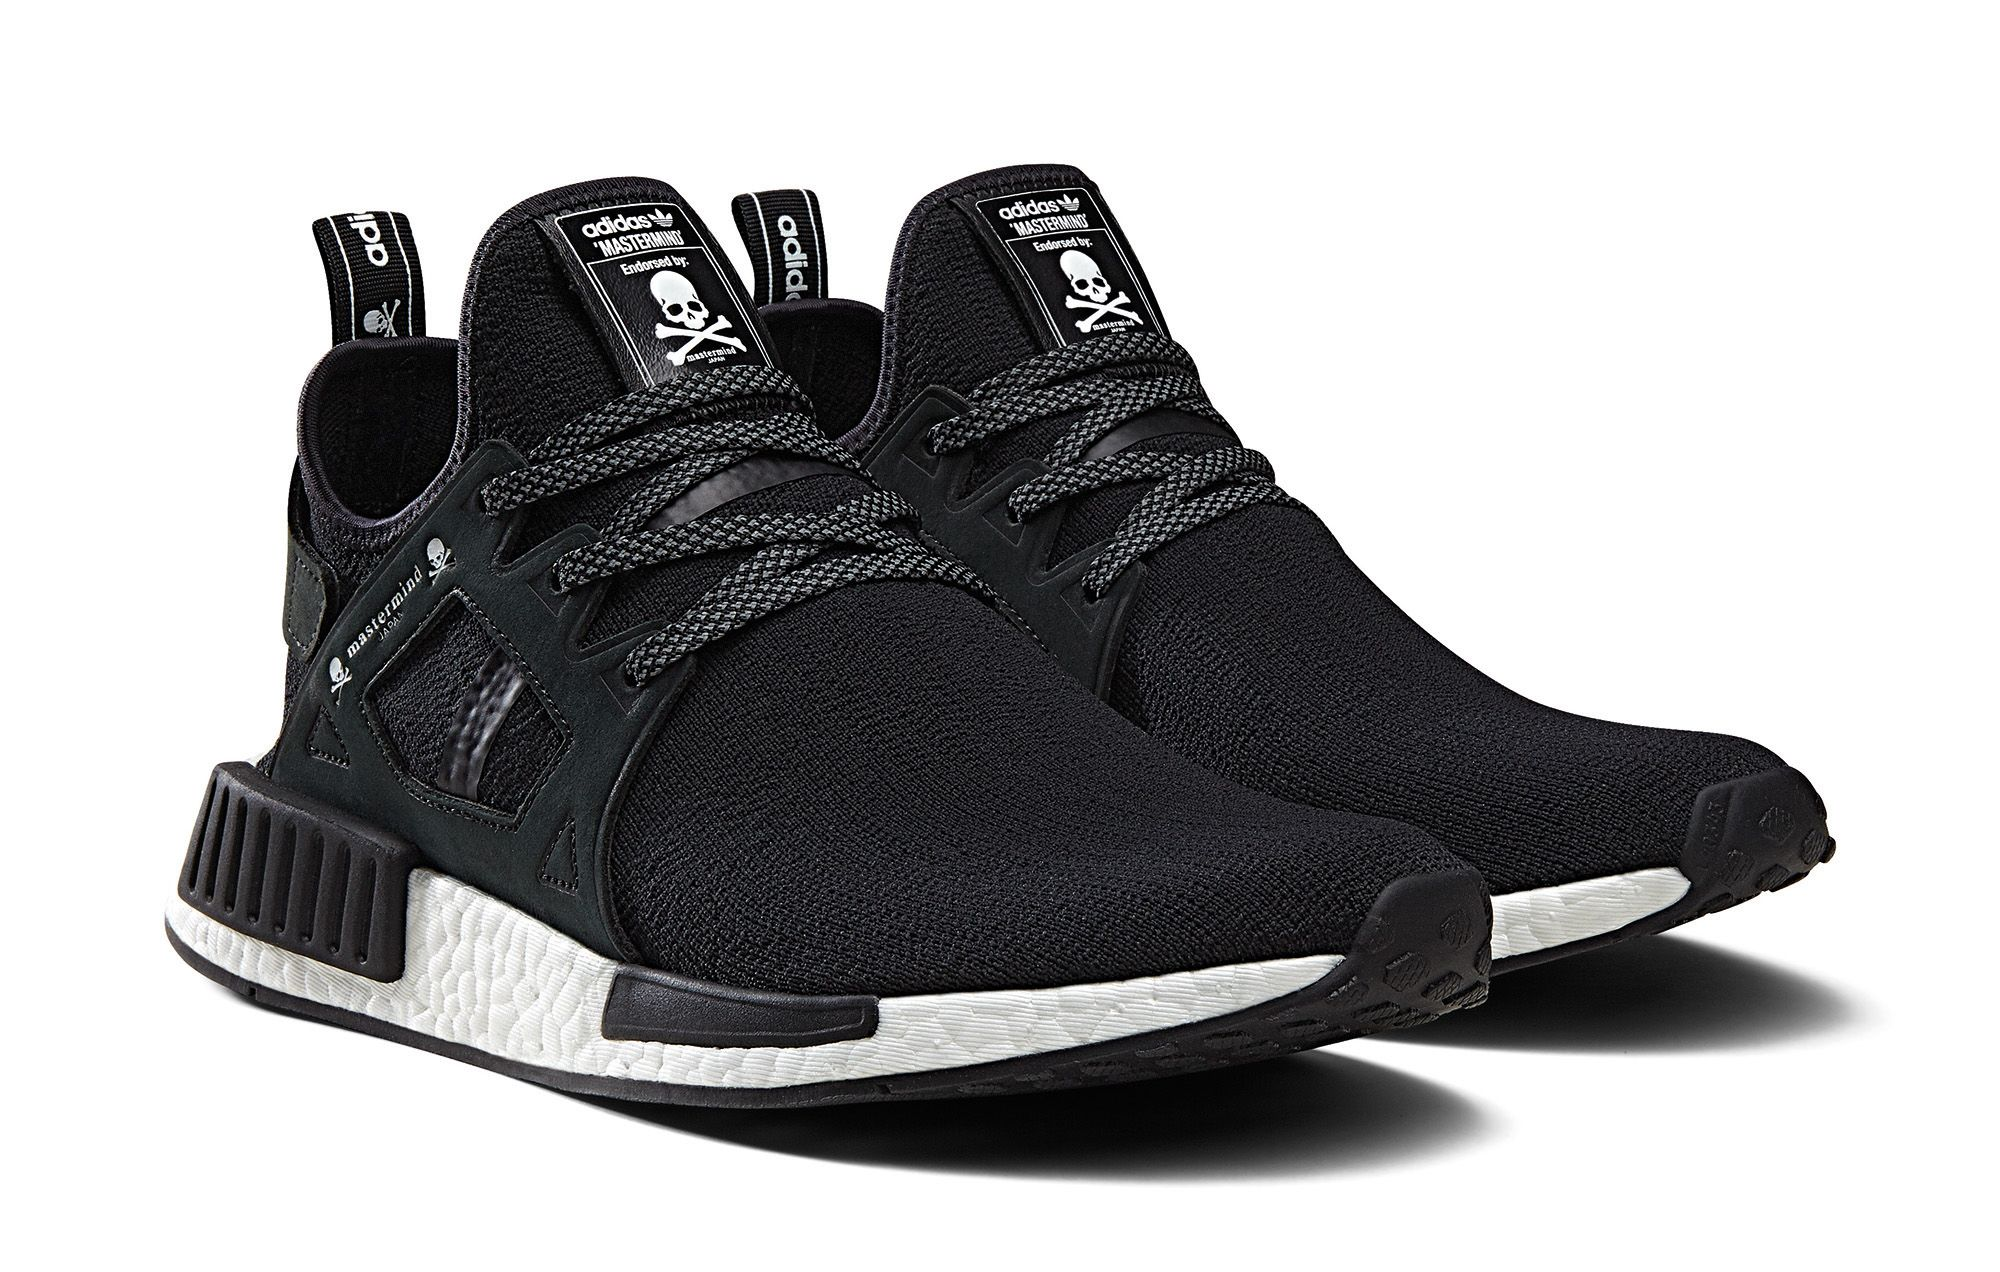 Adidas Originals X Mastermind Japan Statement Injection Pack Adidas Schuhe Sneakers Mode Manner Turnschuhe